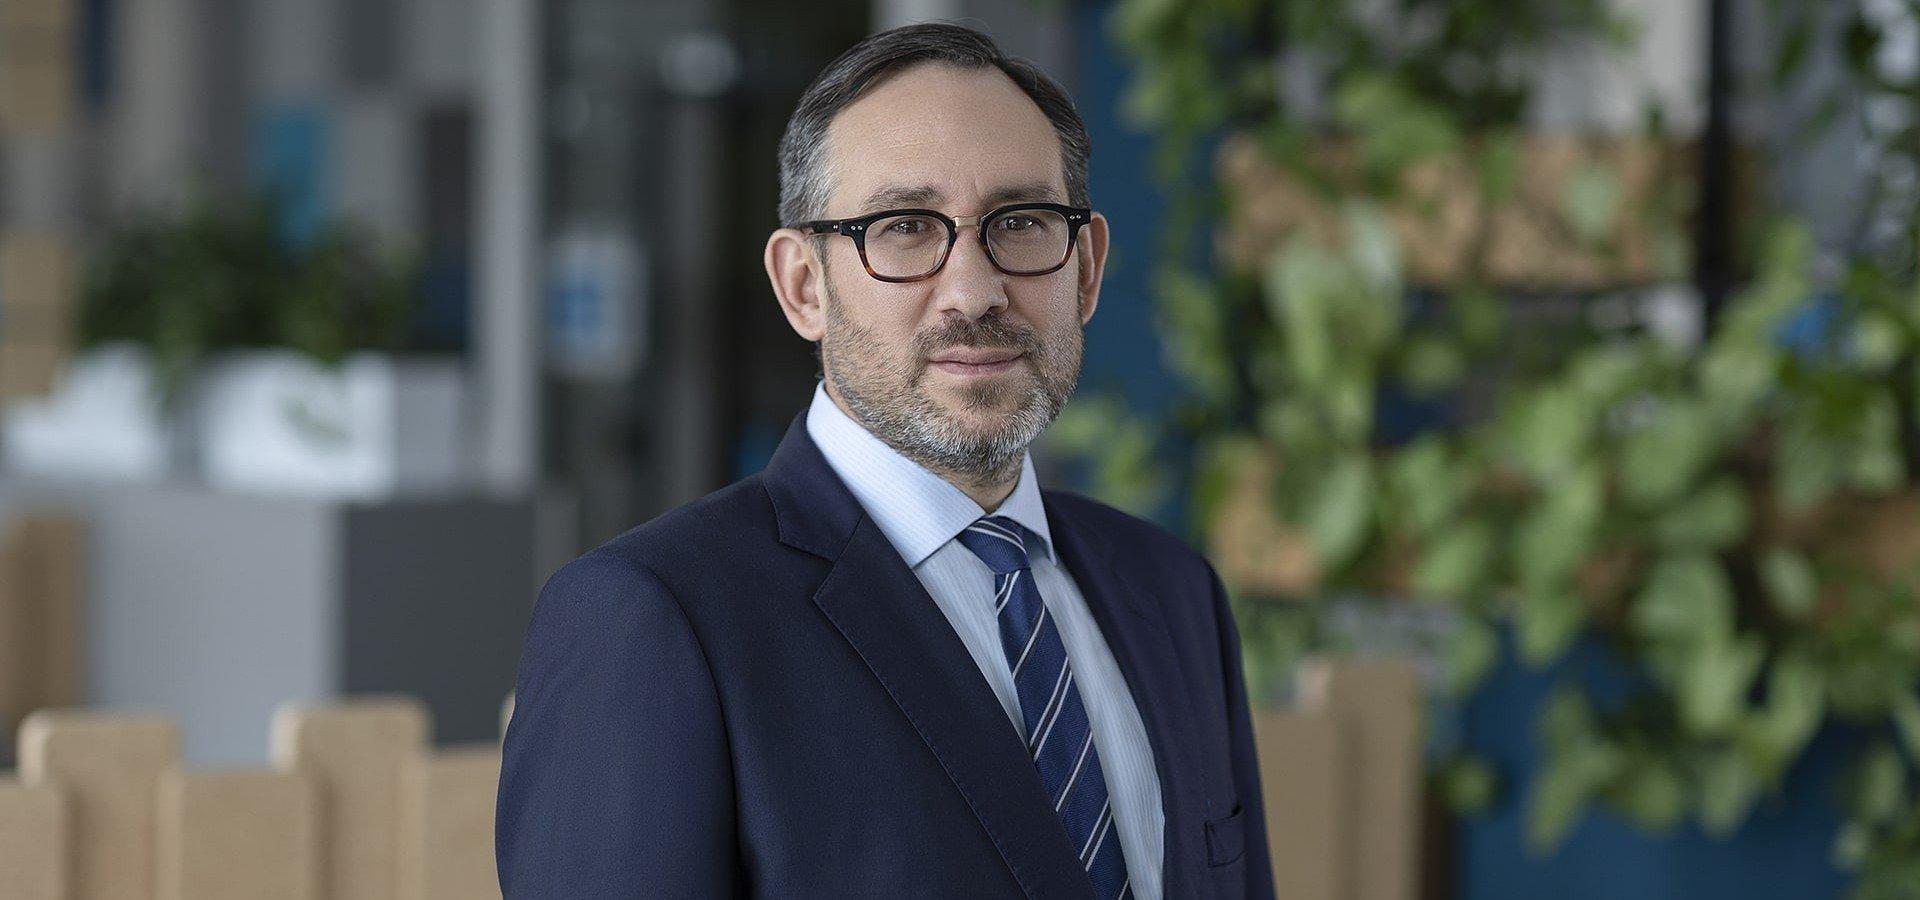 Ponad 12 mln mkw. biur w Polsce